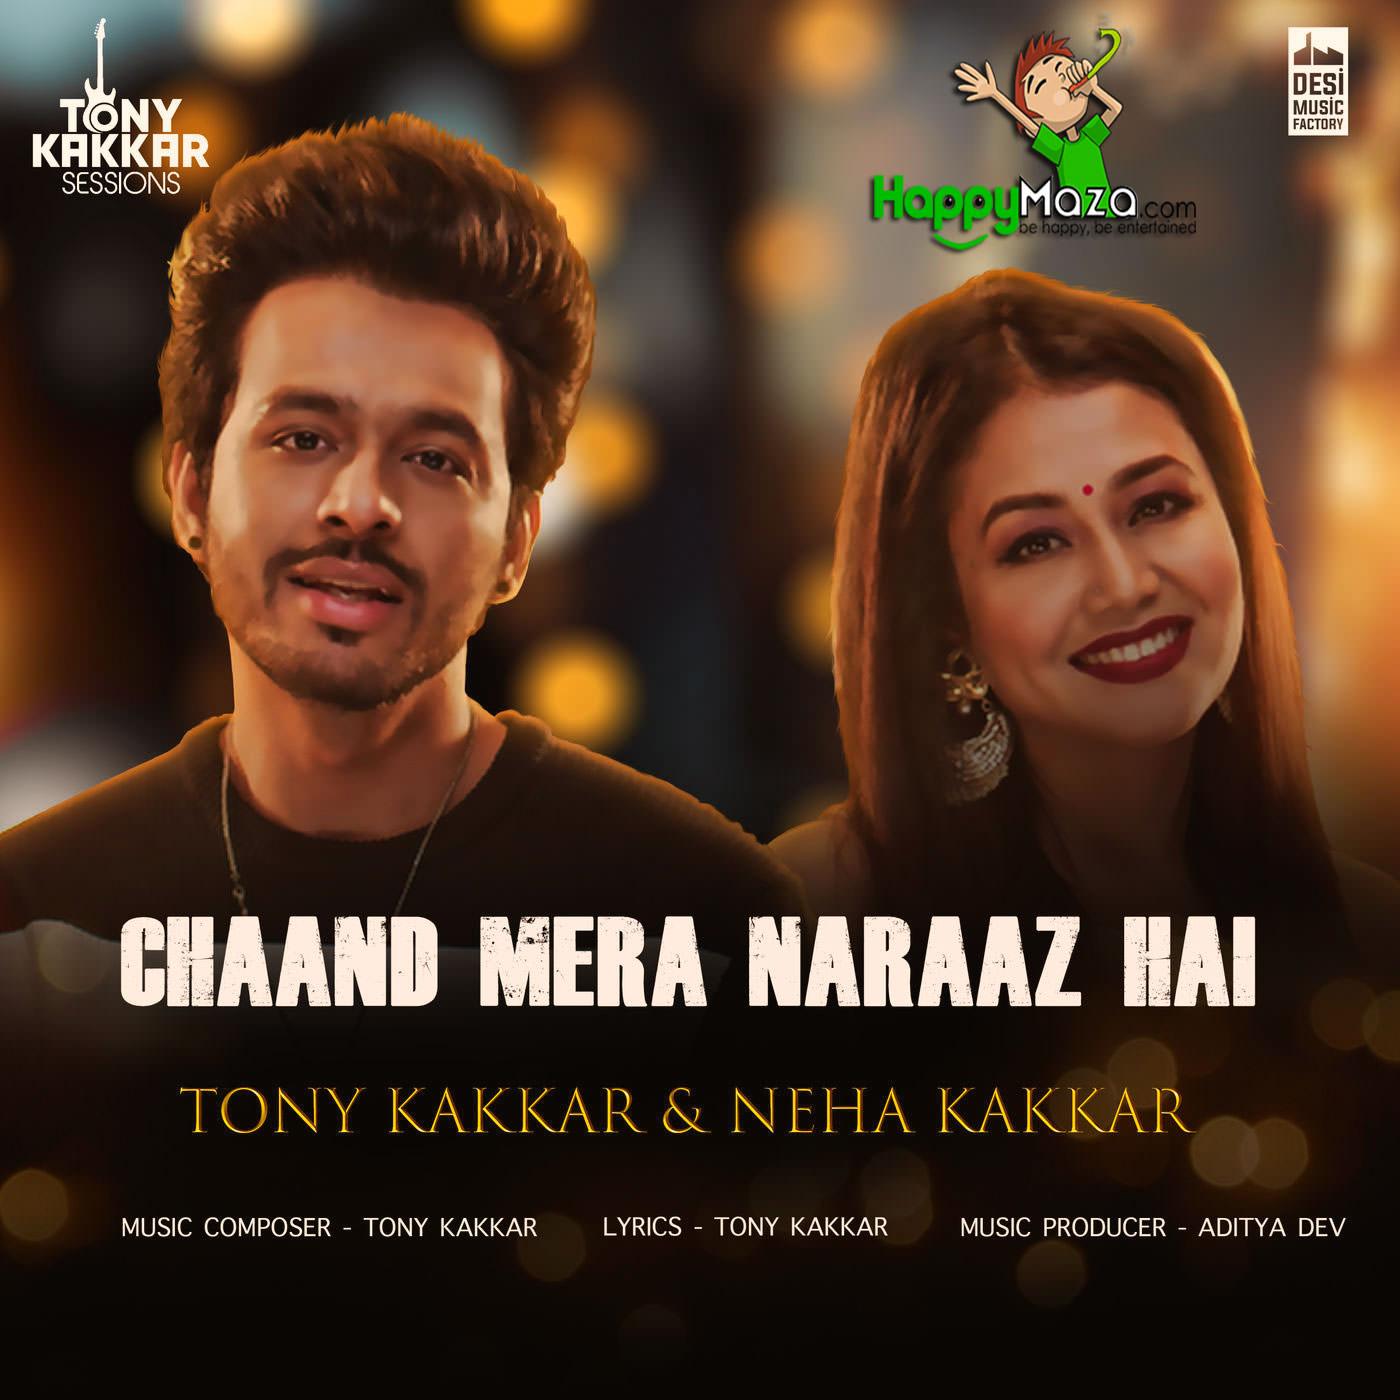 Neino Ki Jo Baat Mp3 Song Dj: Tony Kakkar & Neha Kakkar